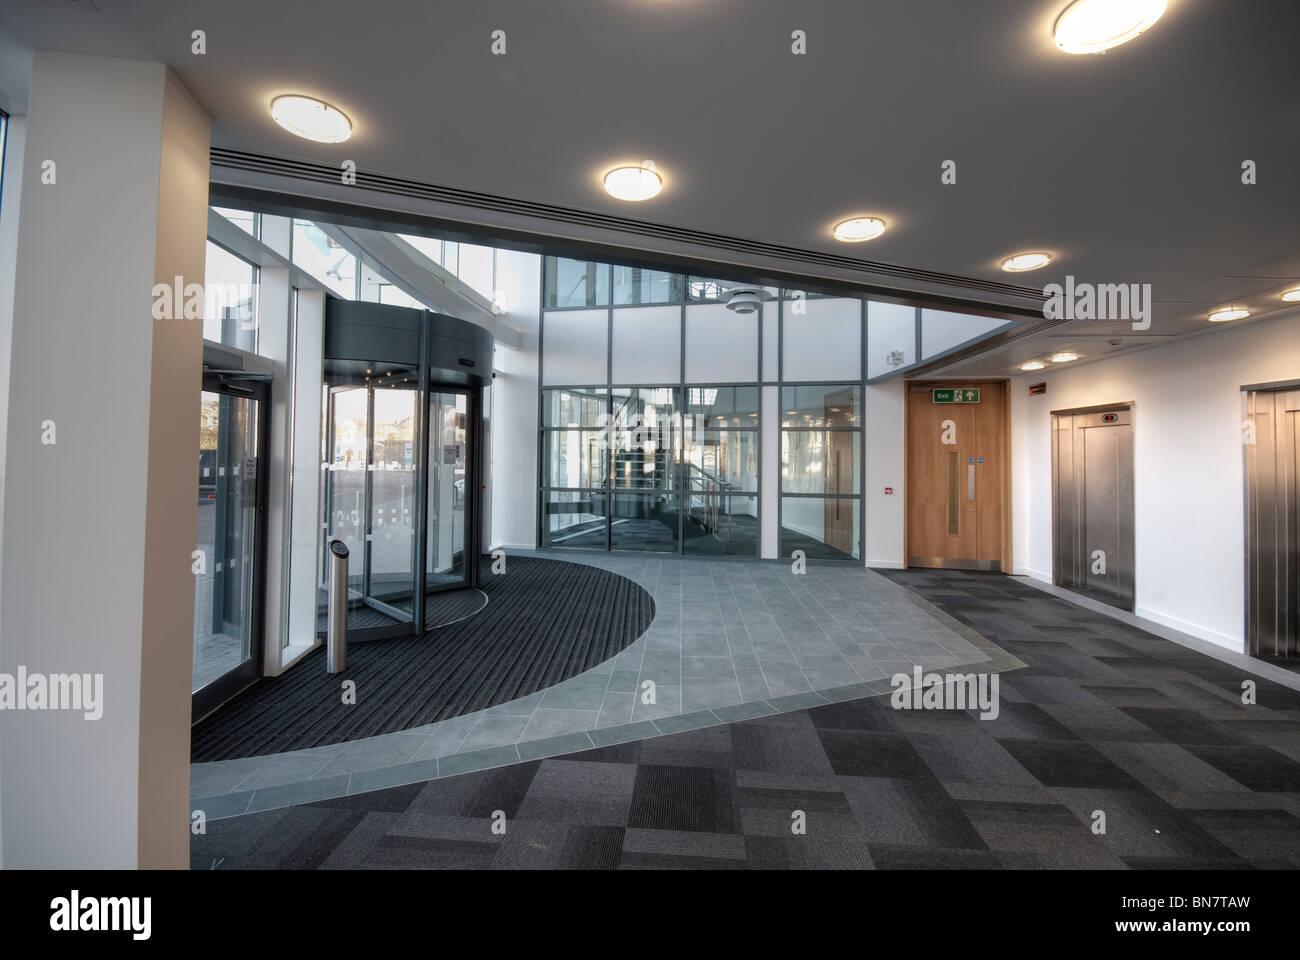 Moderne Büro-Eingang ohne Menschen Stockbild